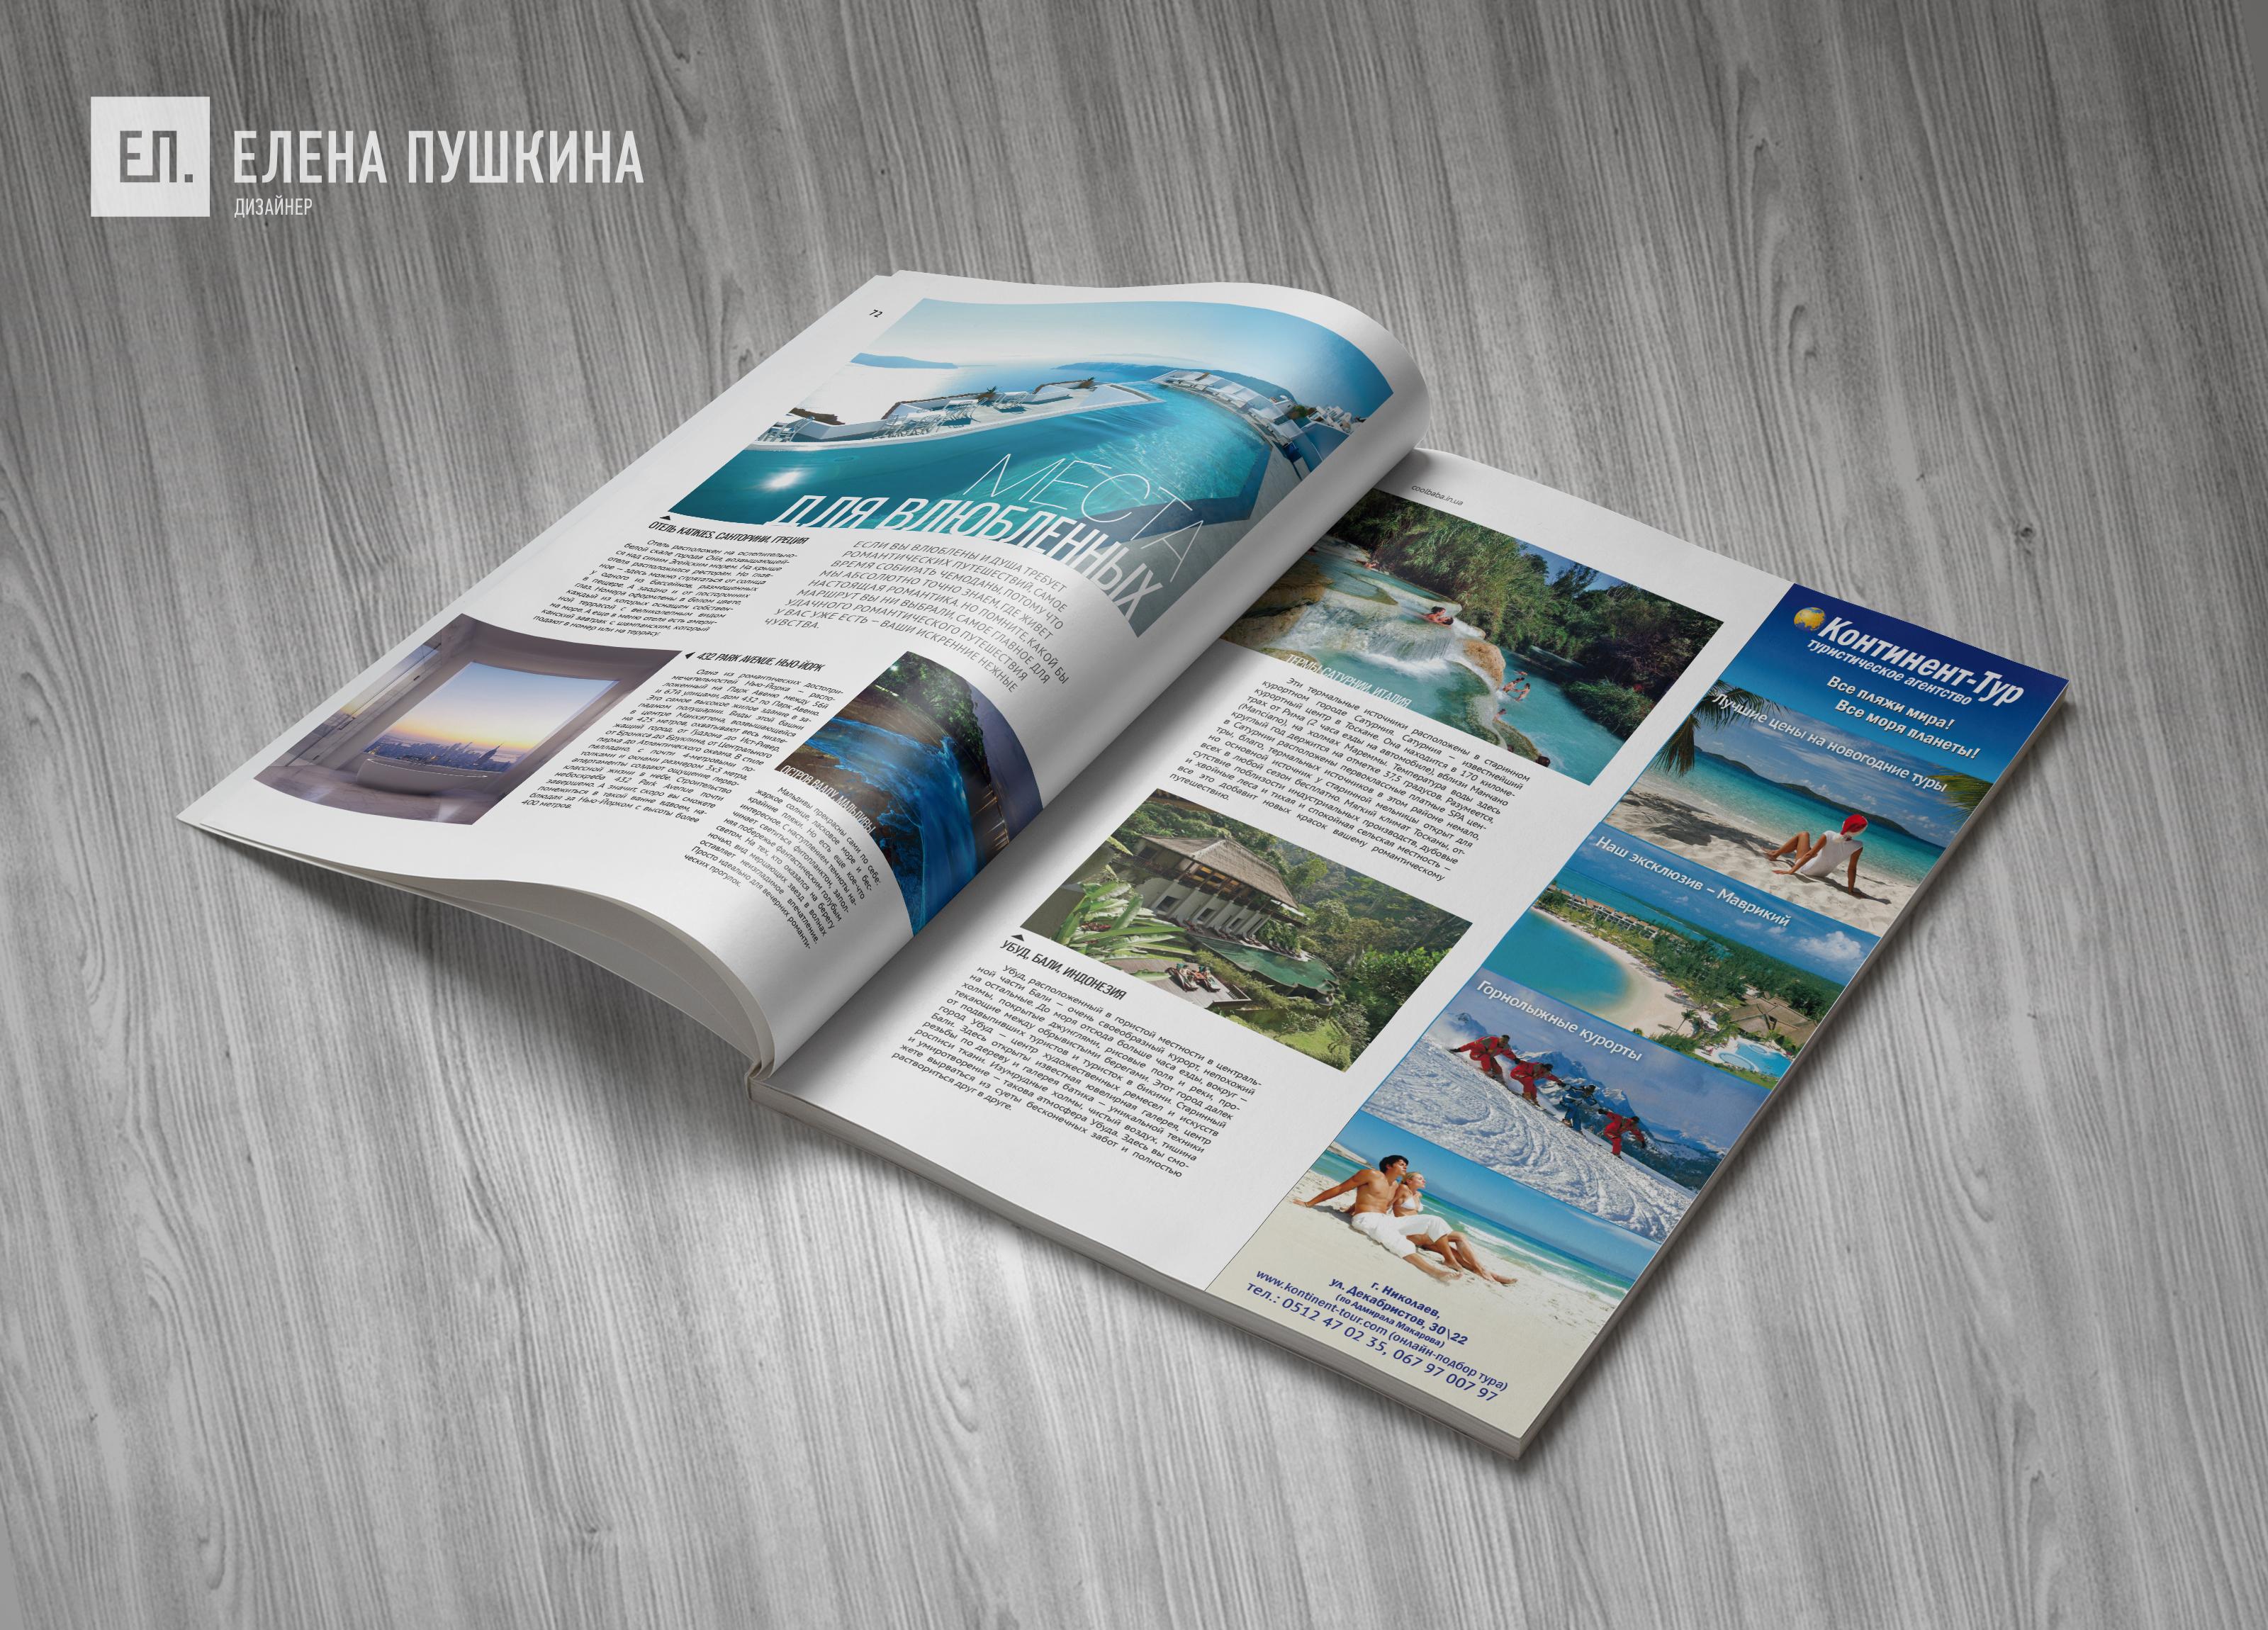 Глянцевый журнал «CoolBaba» №30 2015— разработка дизайна ивёрстка журнала Разработка журналов Портфолио